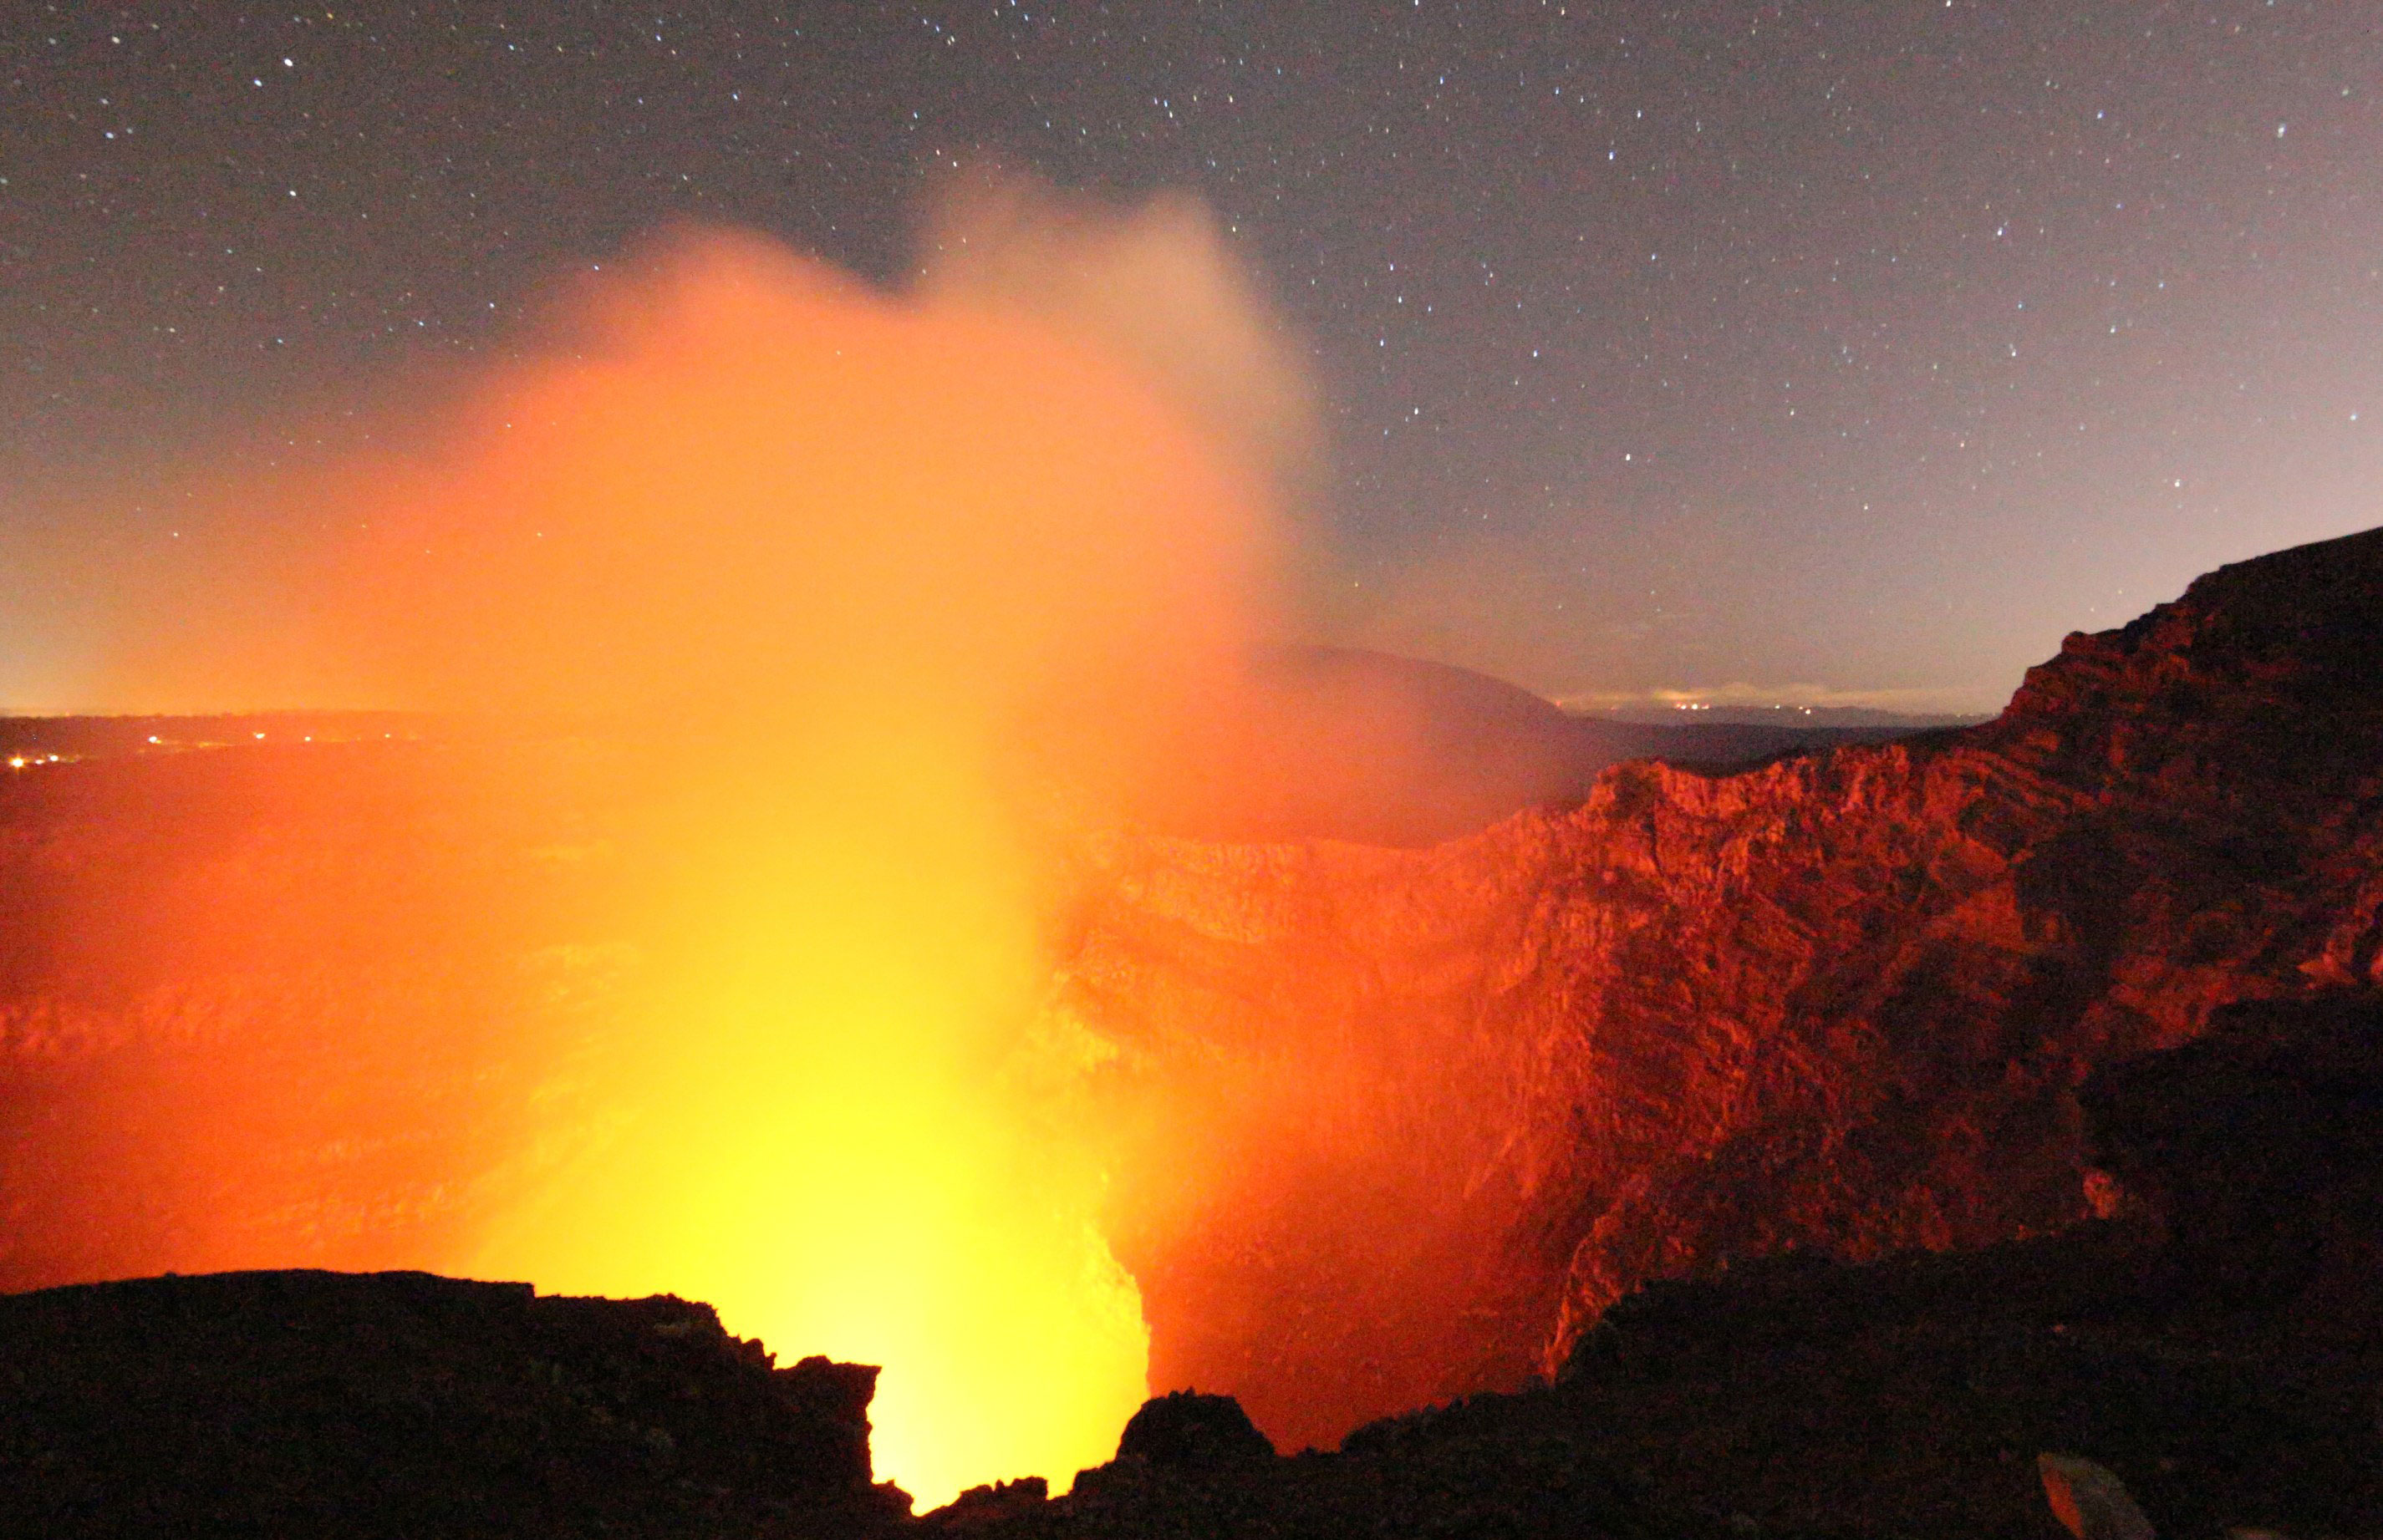 This Filmmaker Captured Insane Images From Inside Nicaragua's Active Masaya Volcano